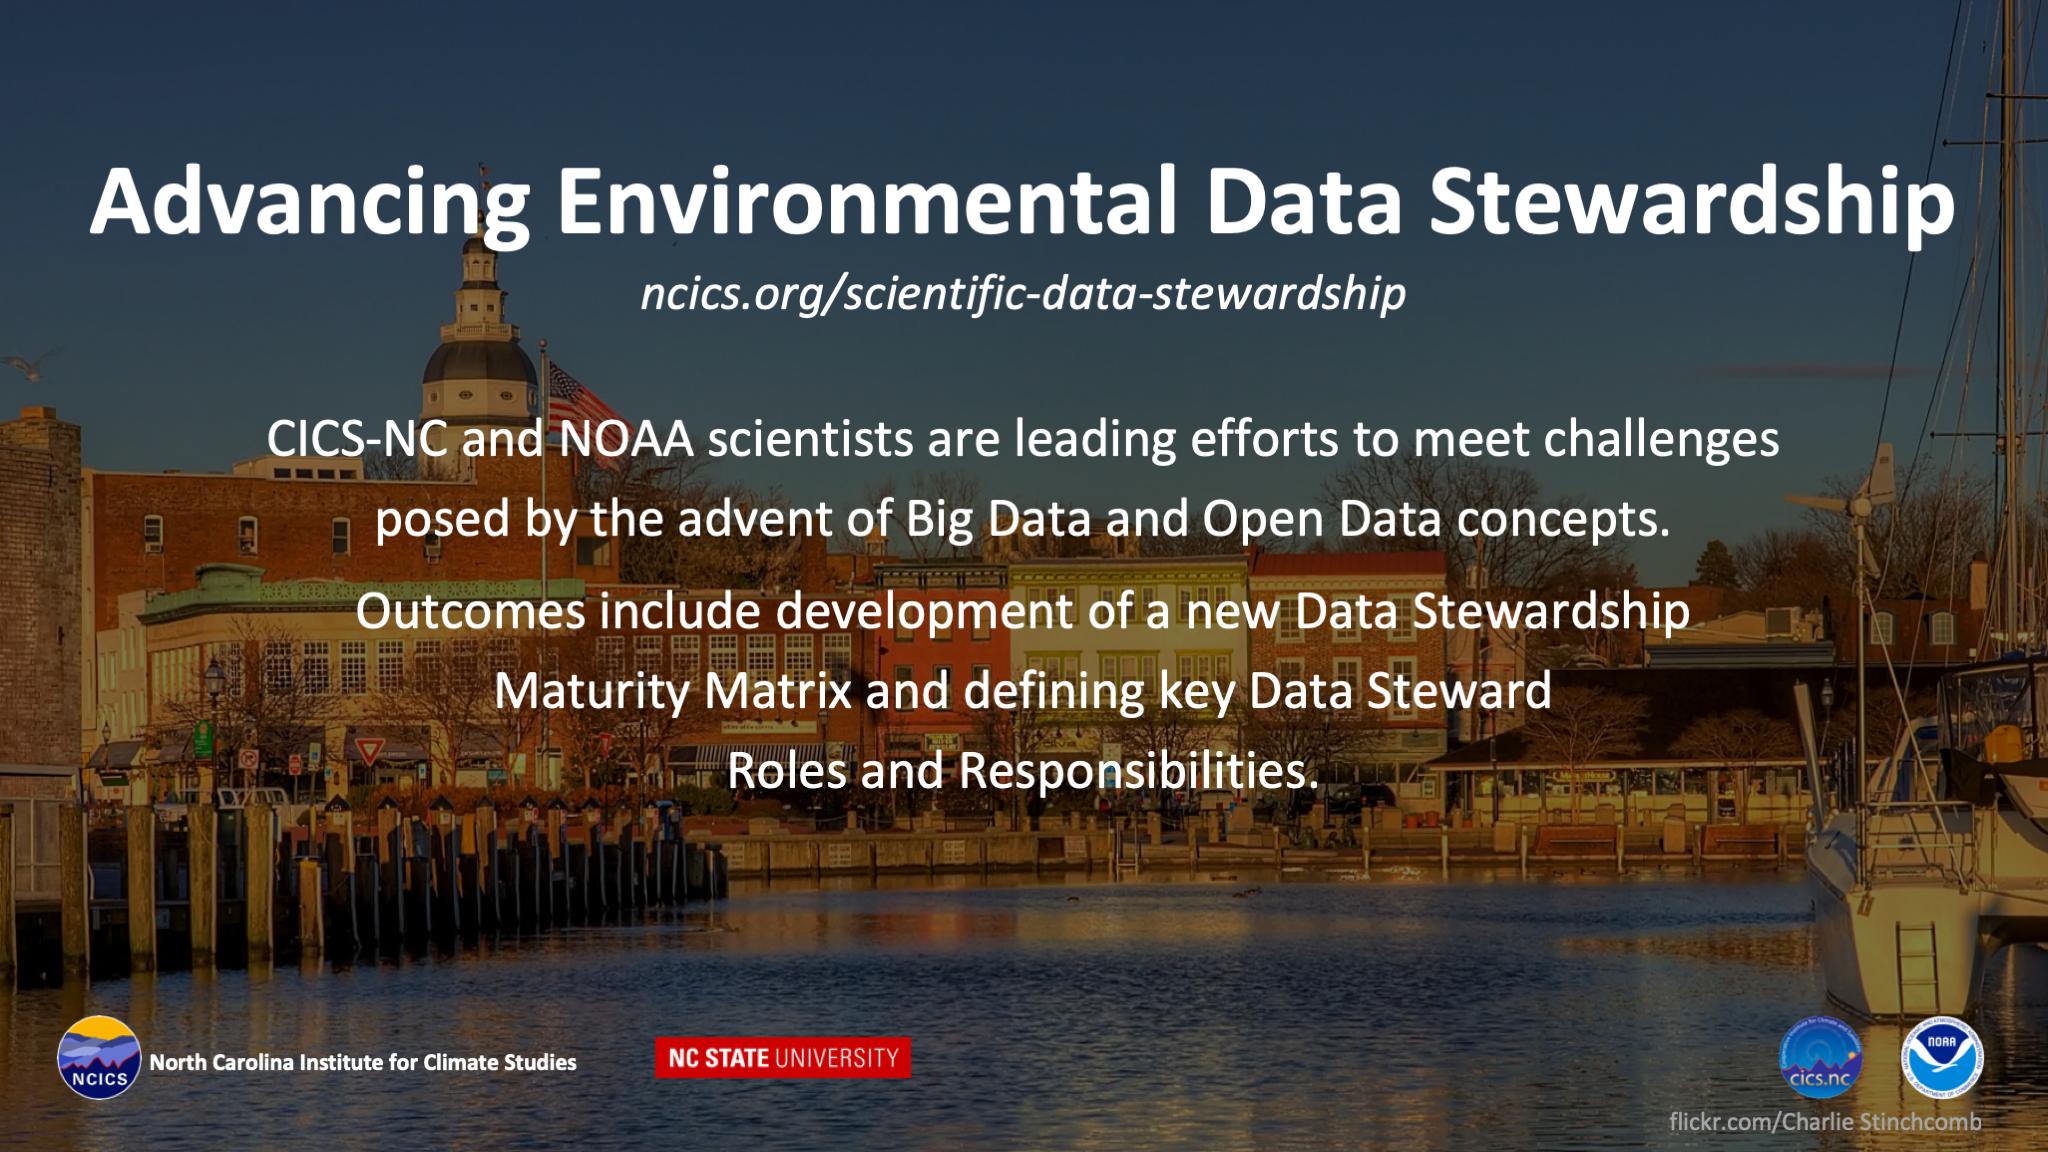 Advancing Environment Data Stewardship